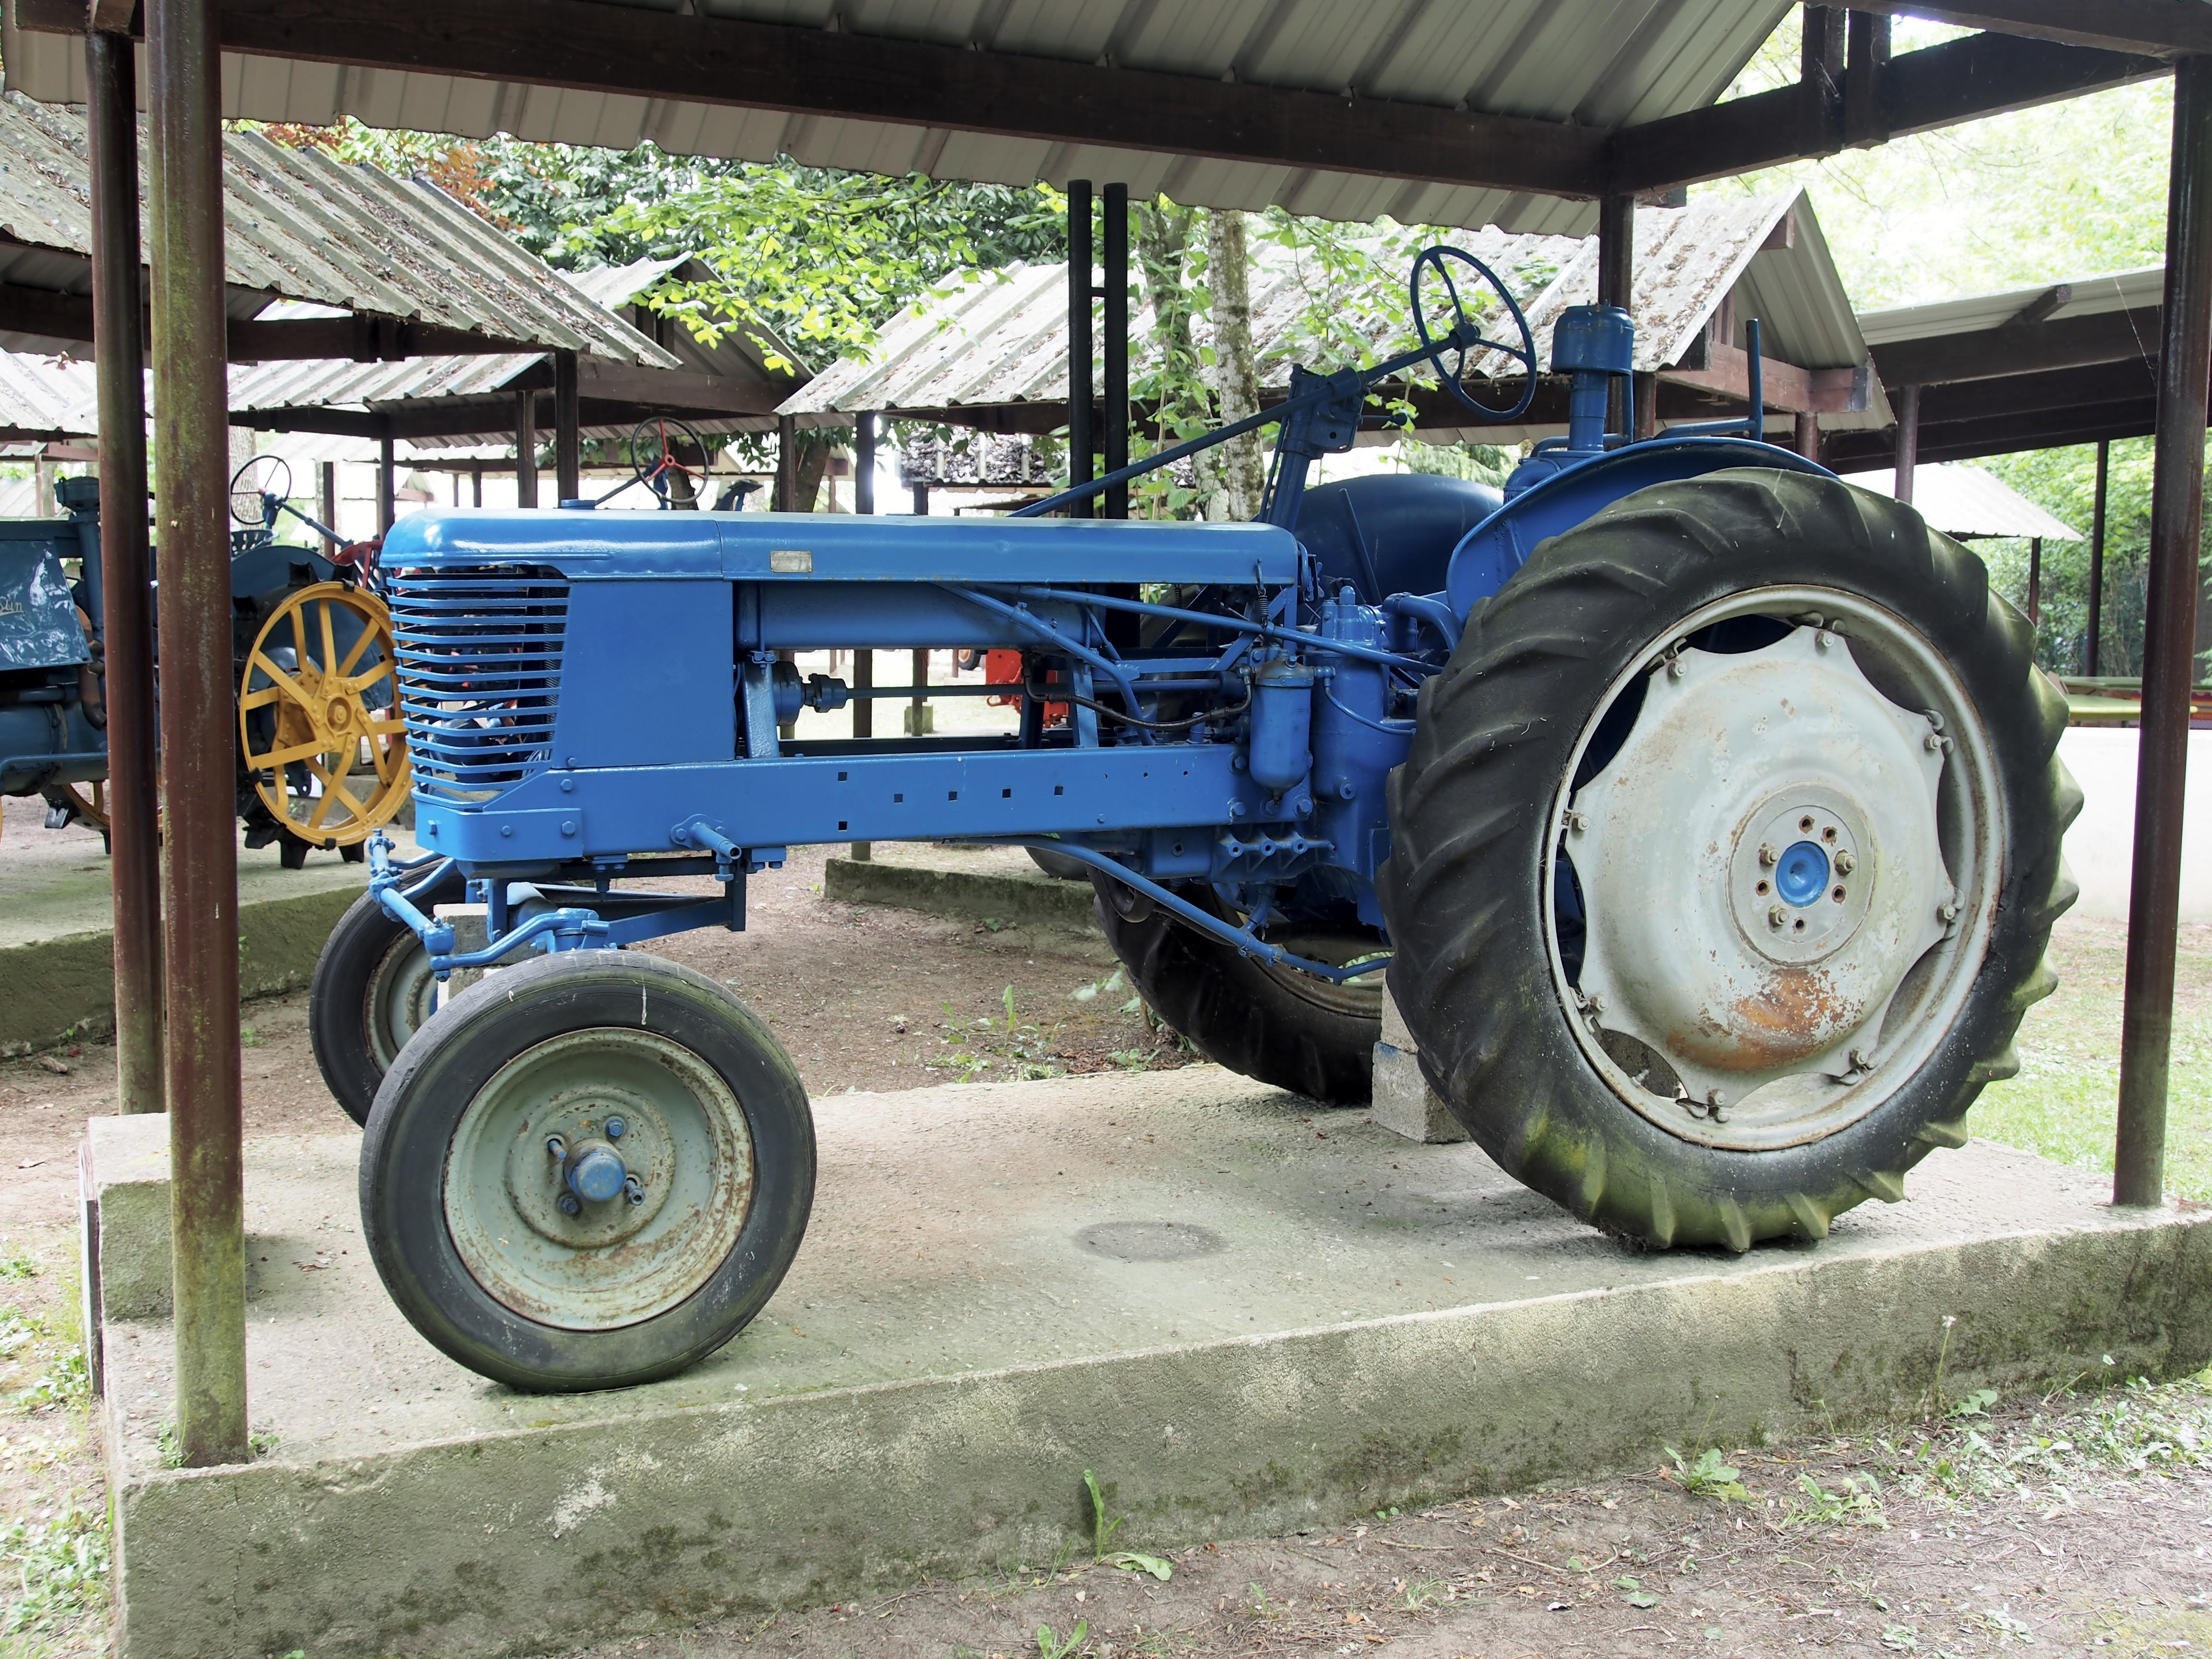 Datei:1950 tracteur Sift H30, Musée Maurice Dufresne photo 2.jpg ...